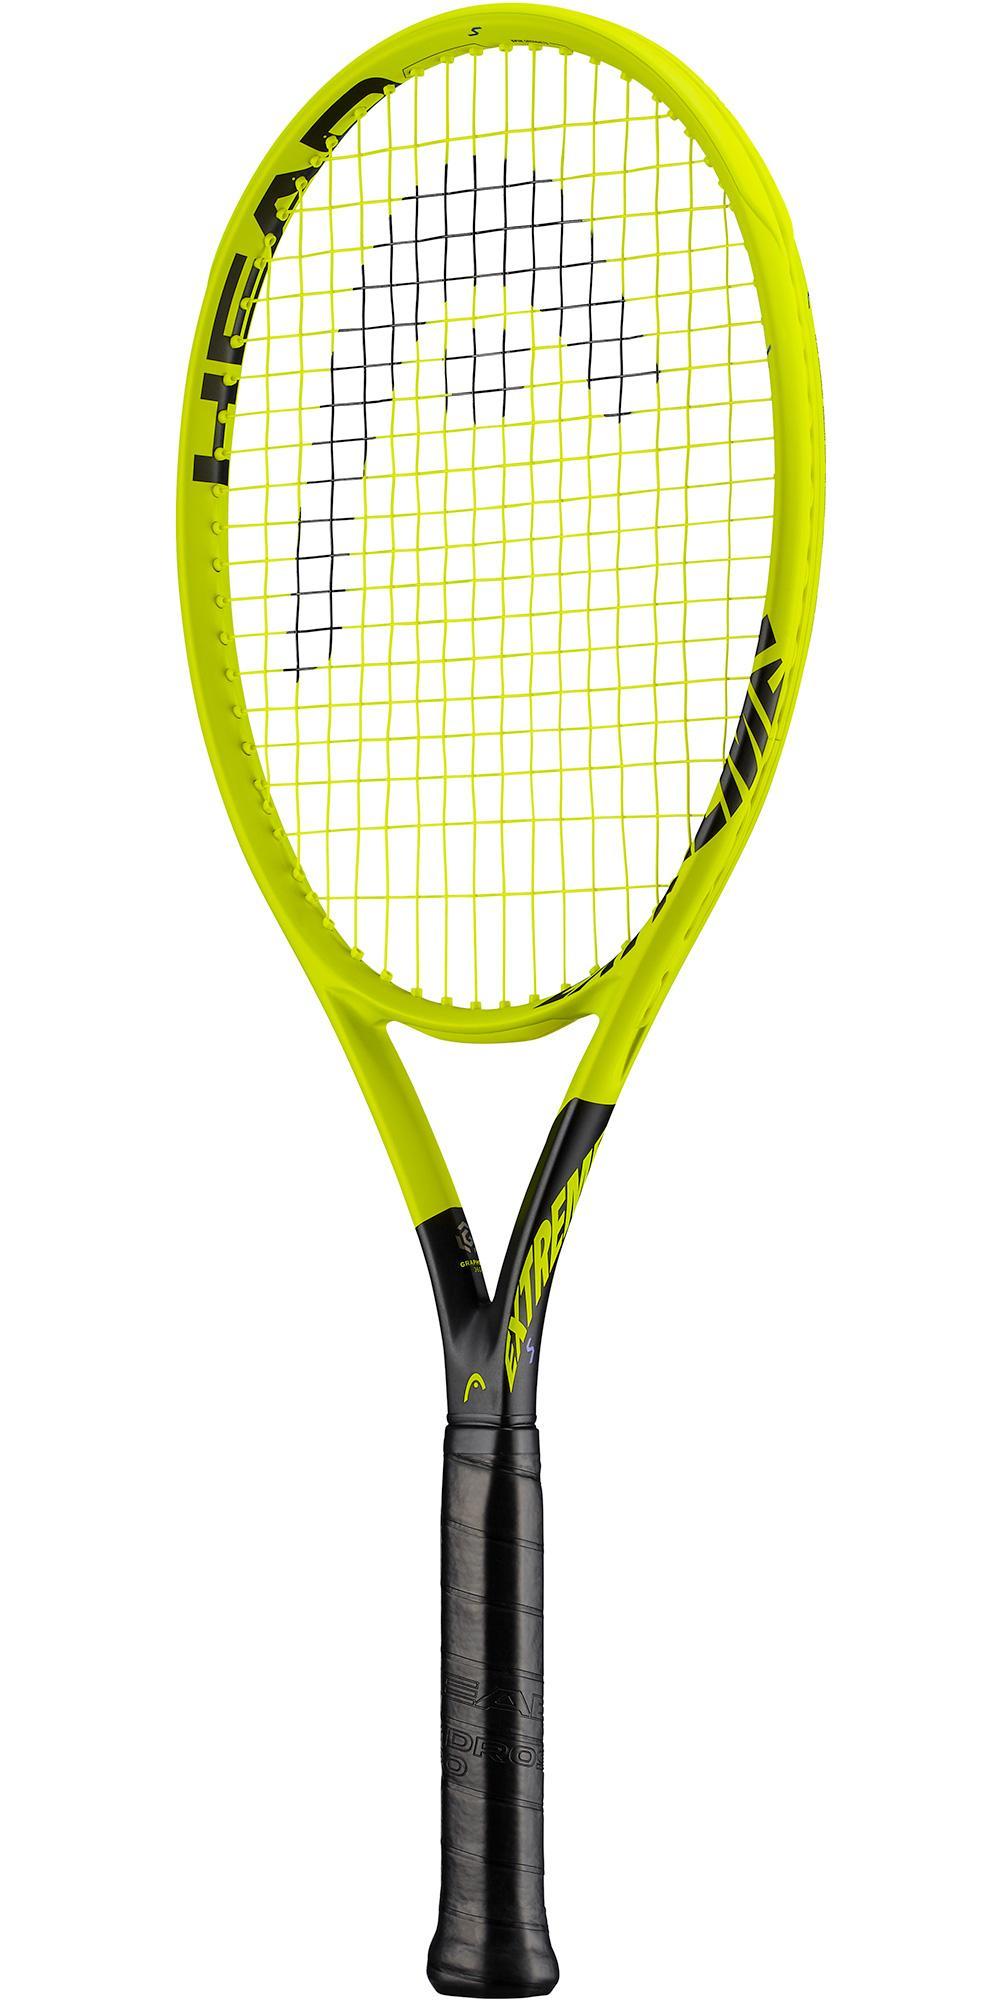 Head Graphene 360 Extreme S Tennis Racket - Tennisnuts.com